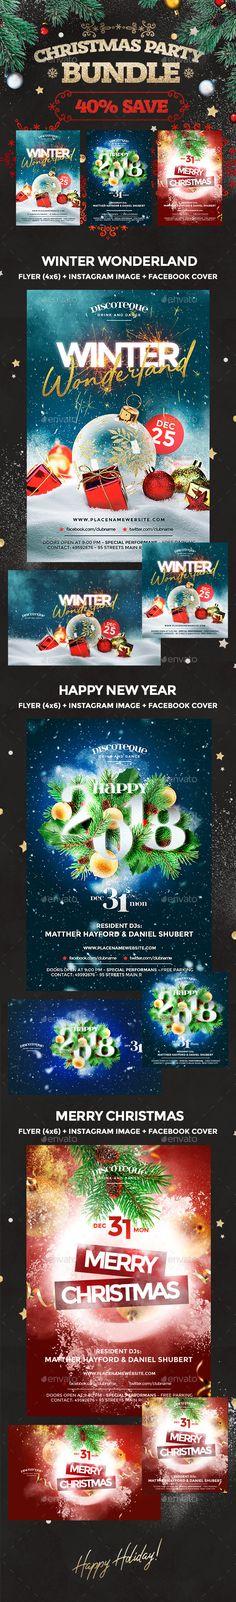 Christmas Flyer Template, Christmas Templates, Christmas Design, Vintage Christmas, Christmas Christmas, Christmas Parties, Party Flyer, Nye Party, Flyer Design Inspiration